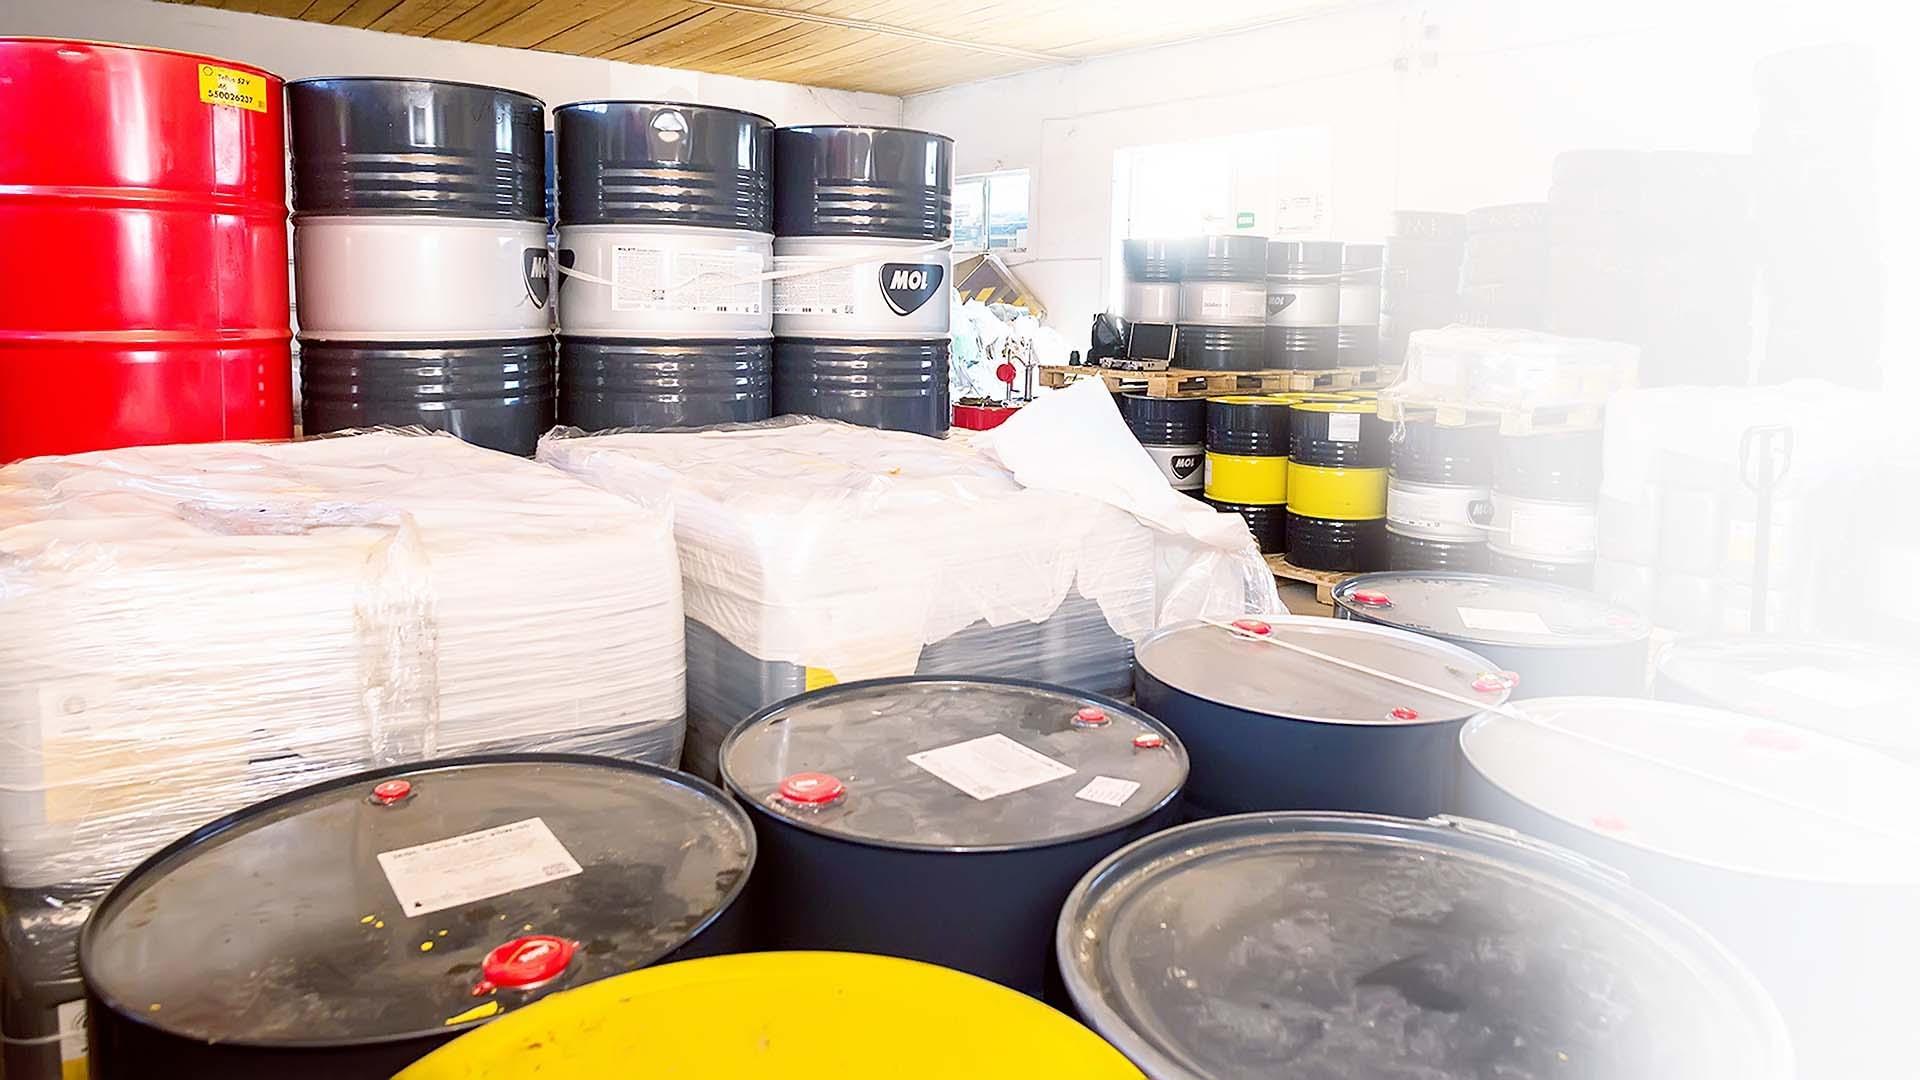 Unitrade-Lubricants-distribuitie-lubrifianti